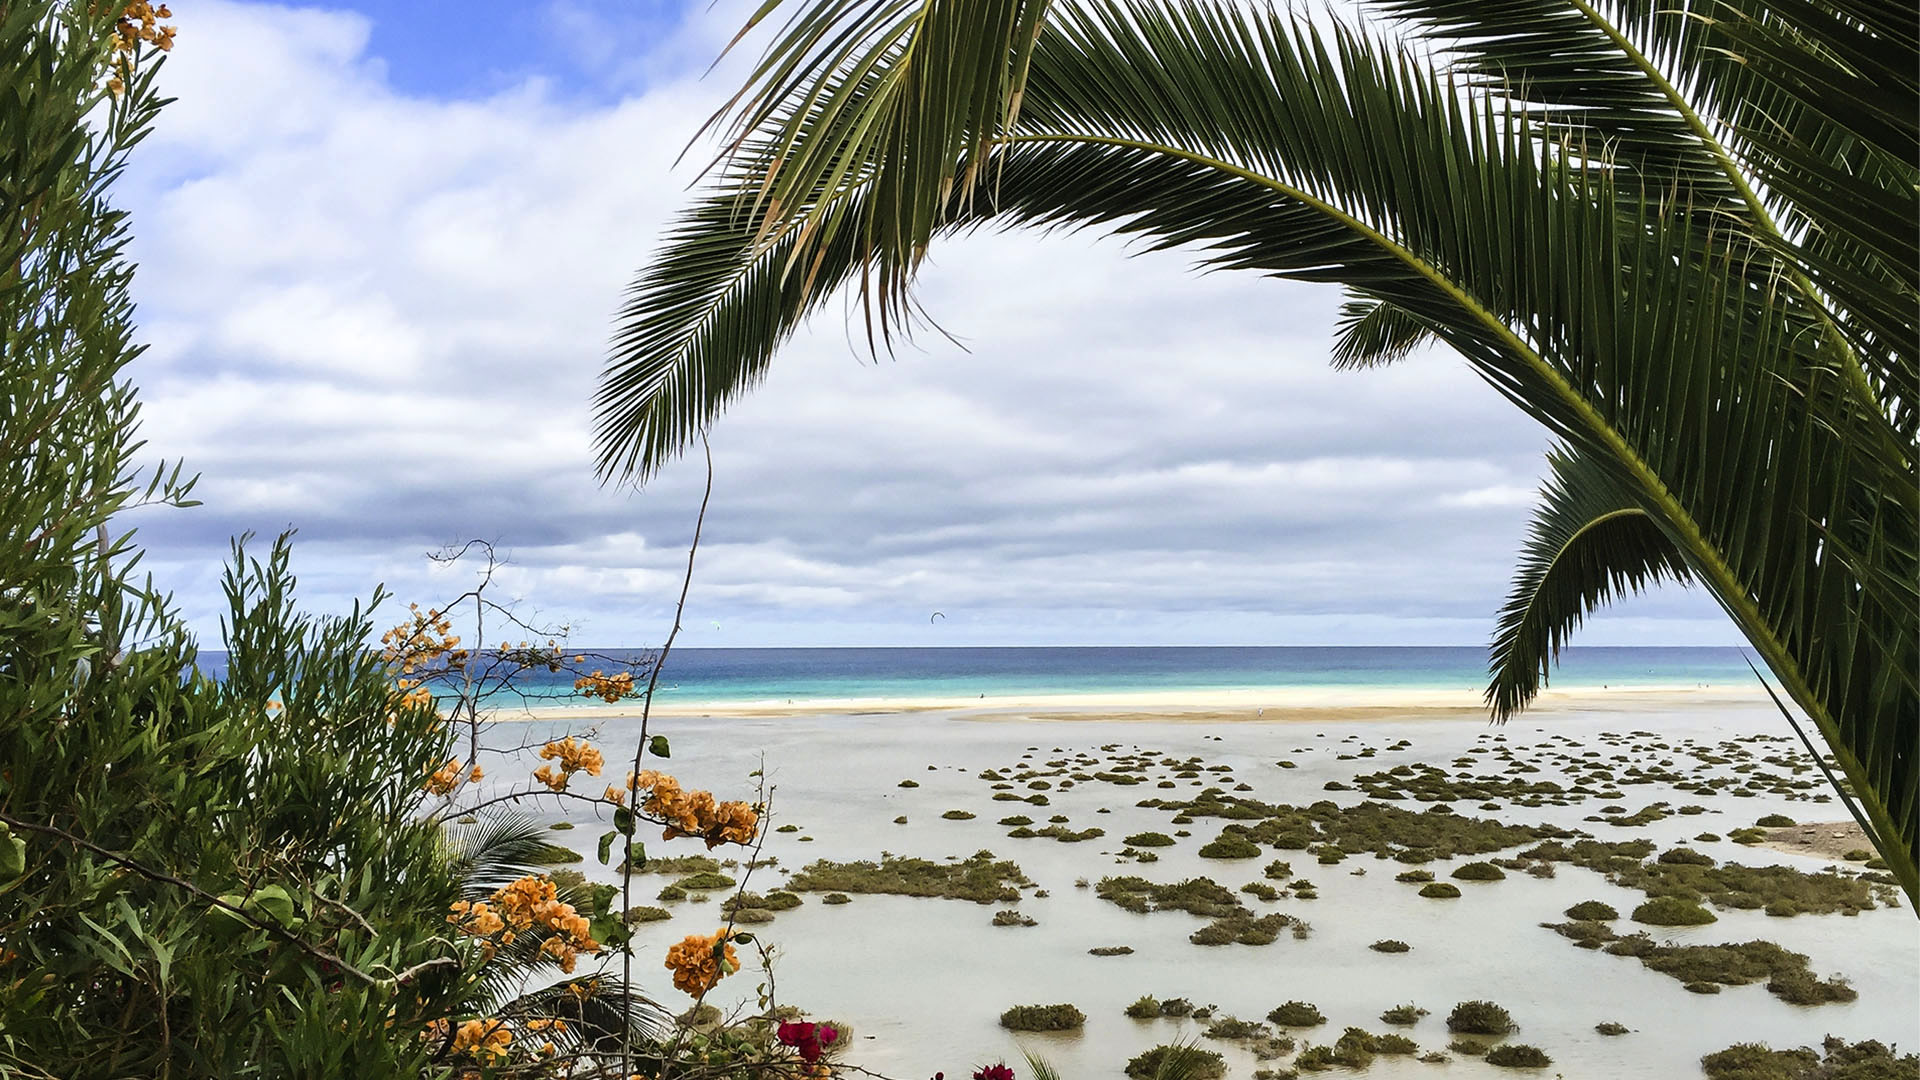 Fuerteventura Inselrundfahrt Südschleife – Costa Calma Ausgangspunkt.